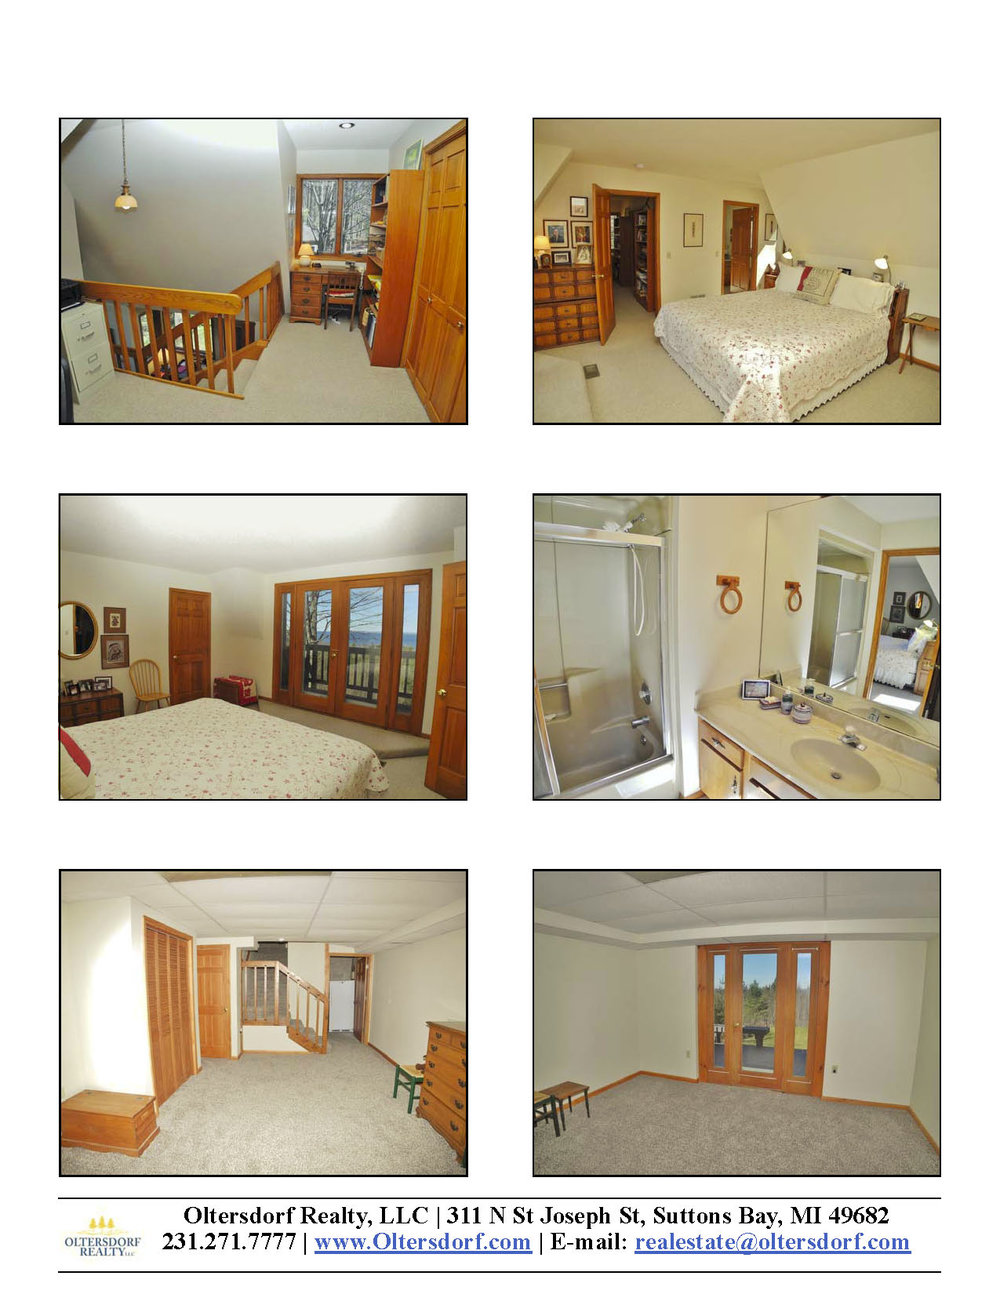 564 S Woodsmoke Drive, Lake Leelanau, MI – Sunset Lake Michigan Water Views - For Sale by Oltersdorf Realty - Marketing Packet (7).jpg